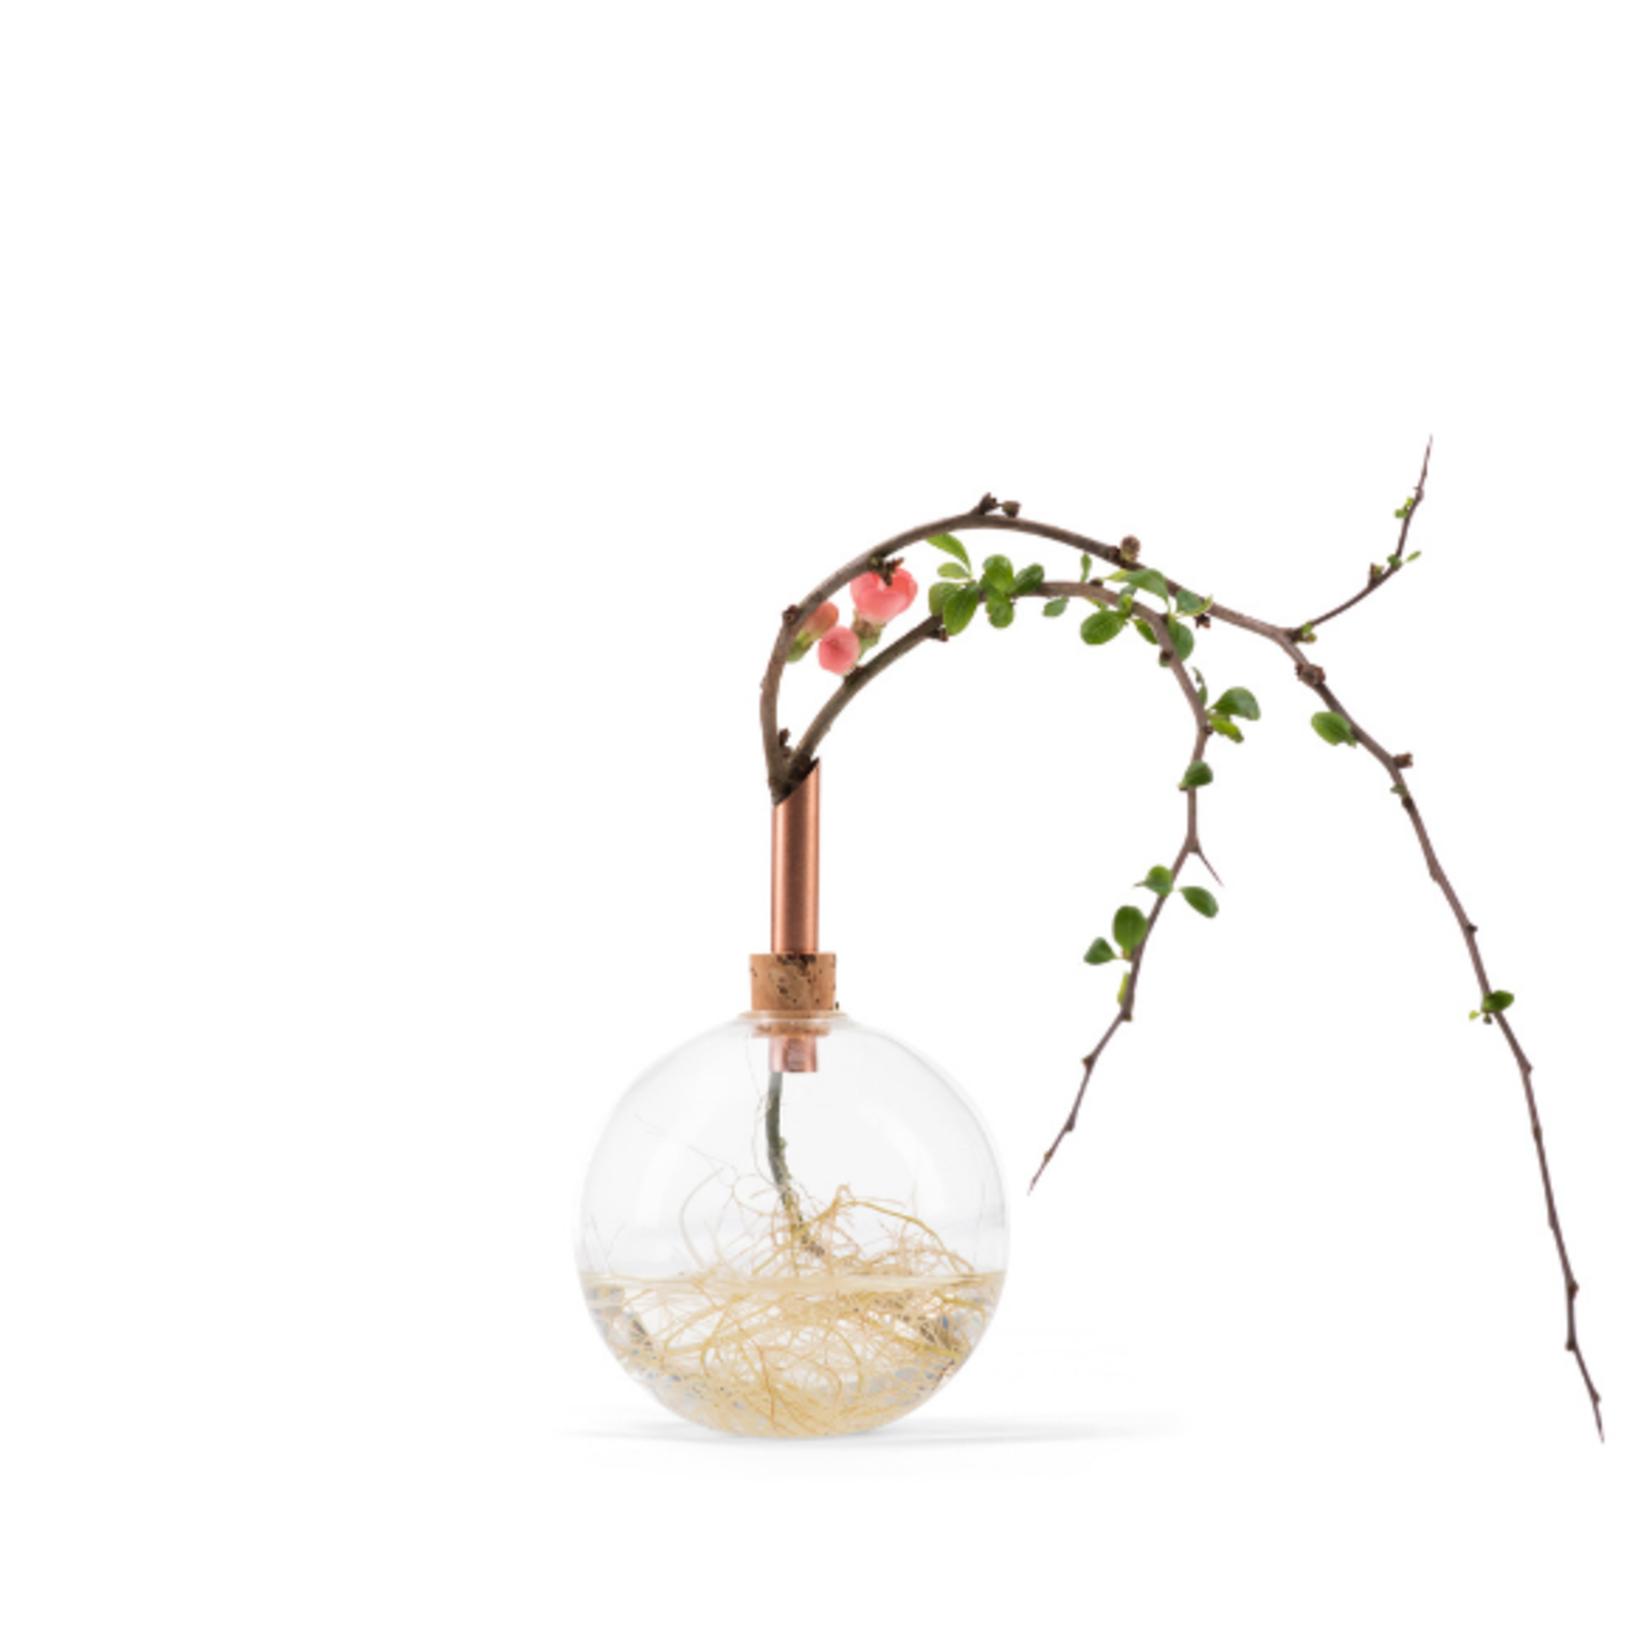 scandinavia form scandinavia form - glasilium vase - medium